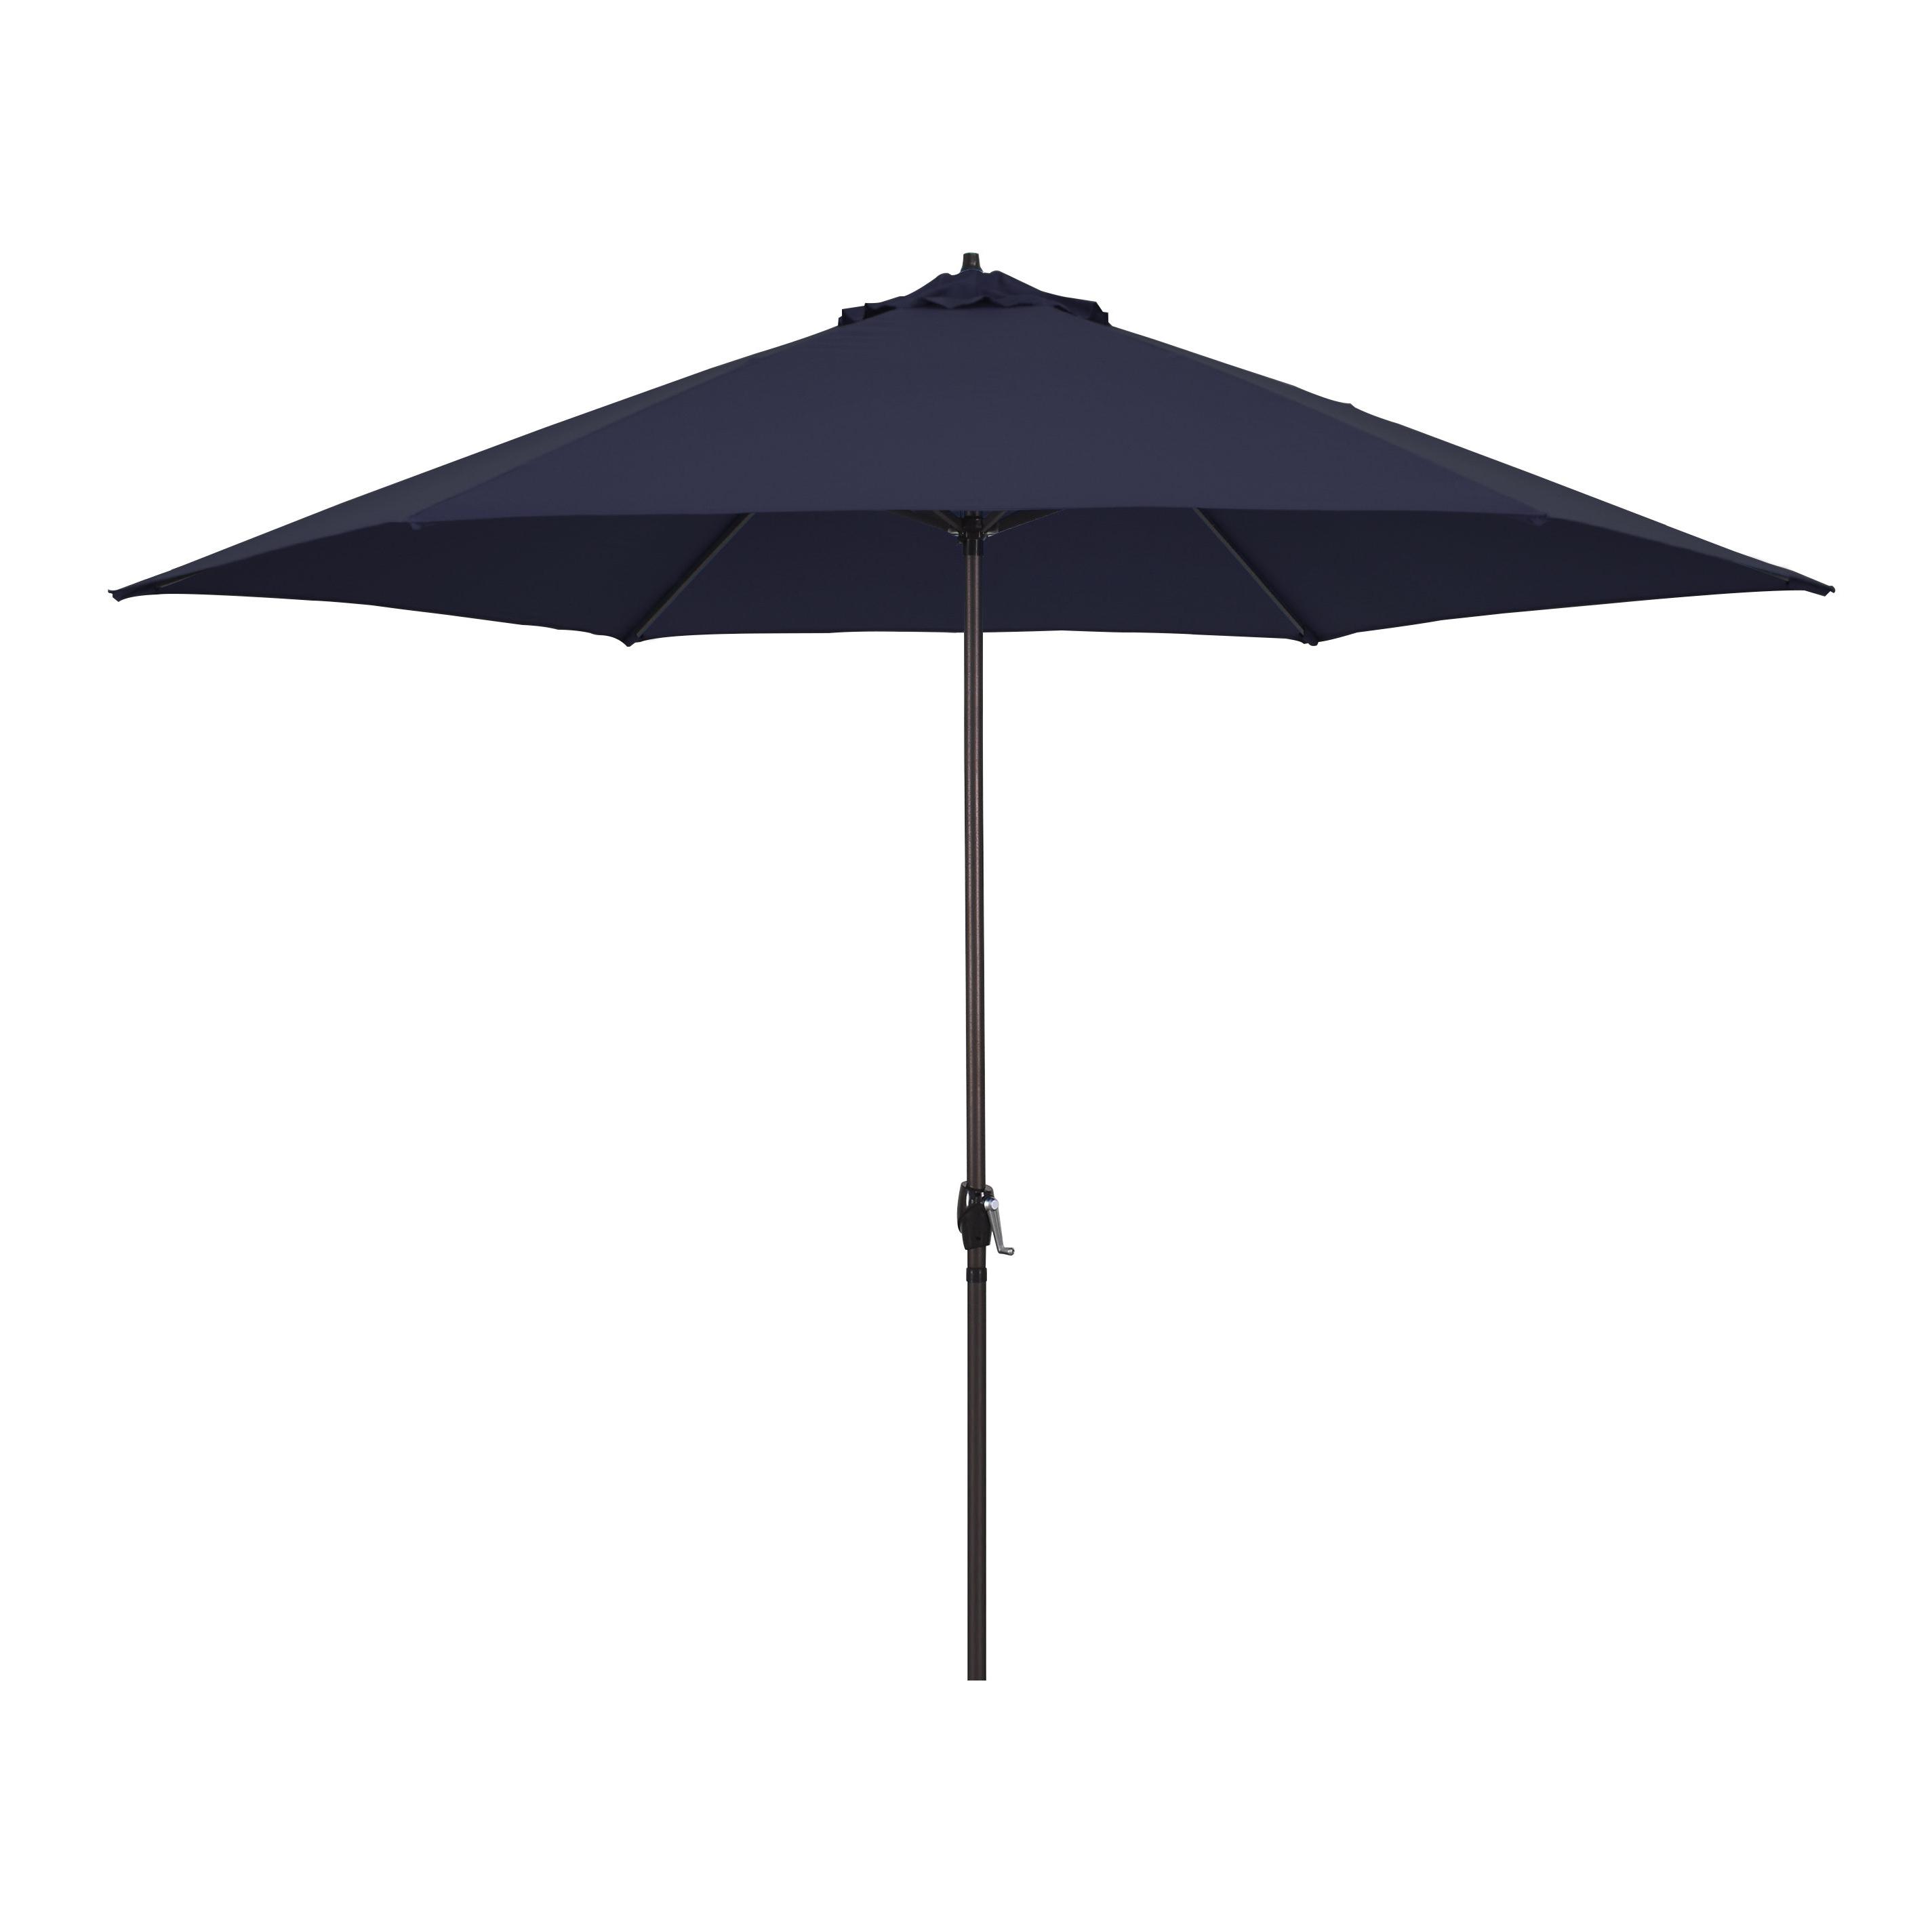 Newest Mcdougal Market Umbrellas In Mcdougal 11' Market Umbrella (Gallery 1 of 20)